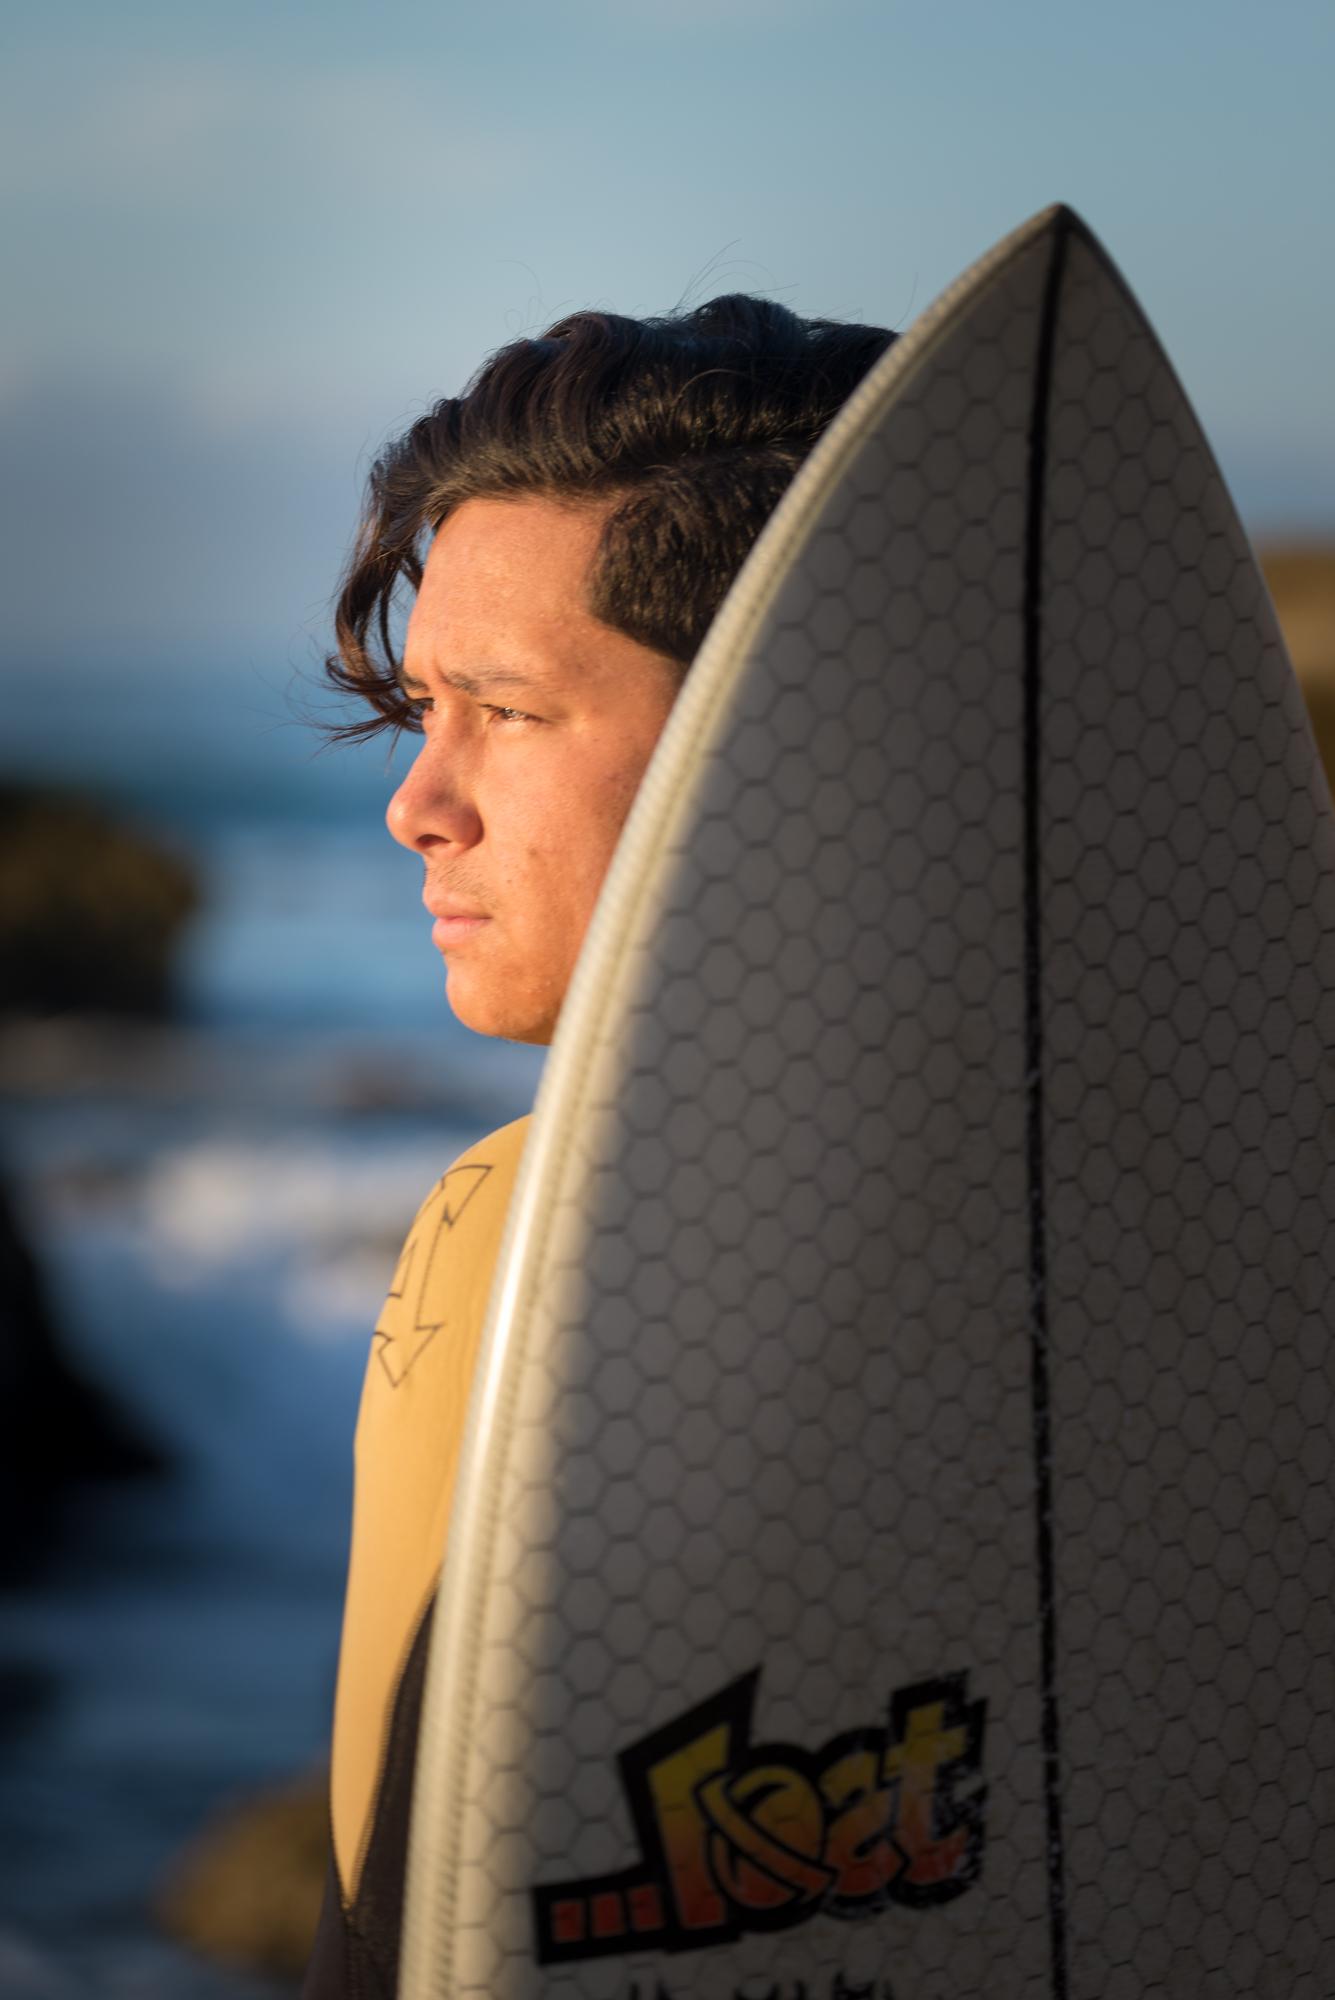 Surfer-Environmental-Portrait_Active-Lifestyle-Photography004.JPG